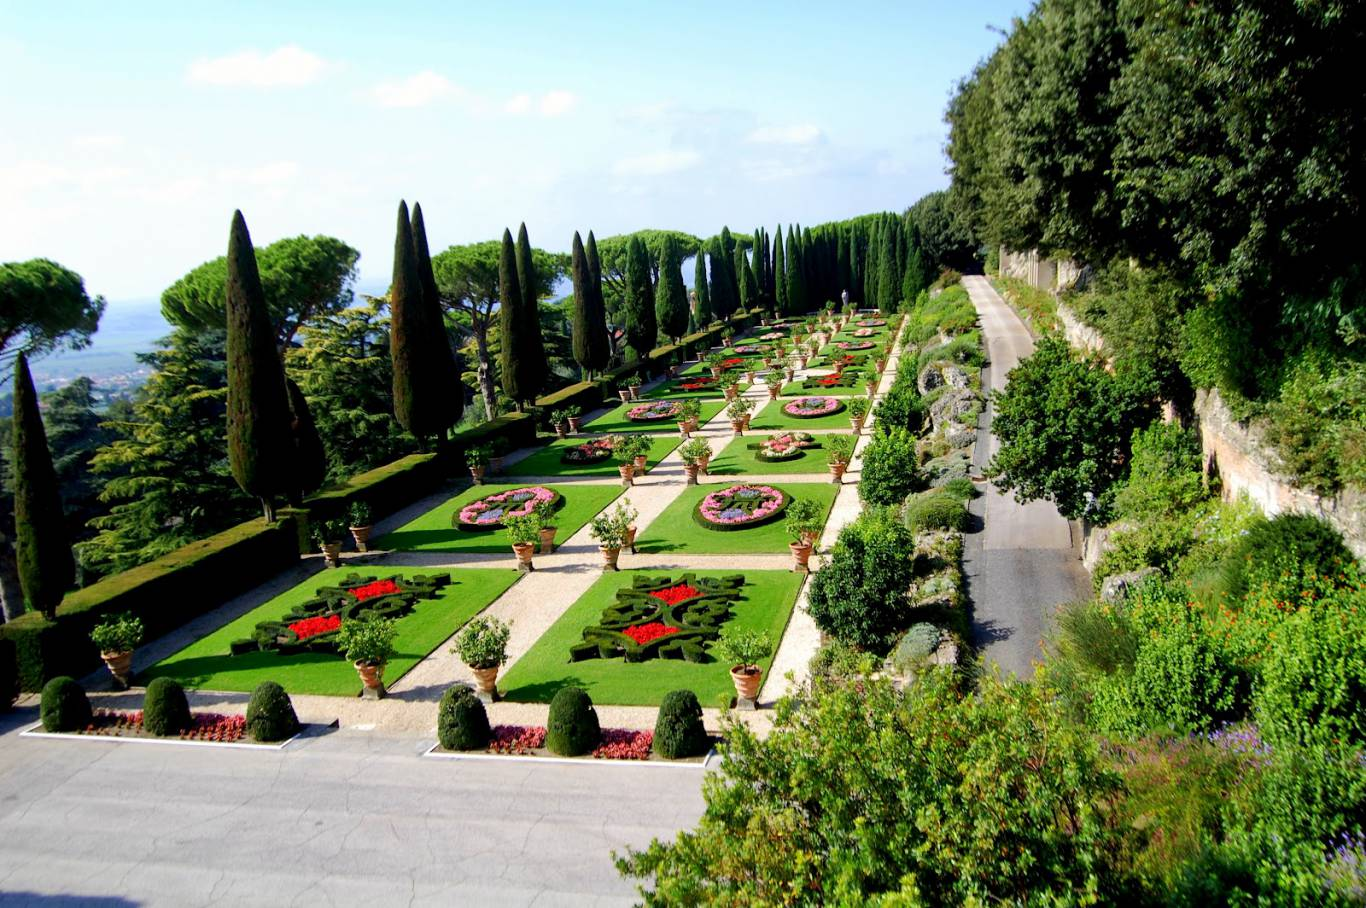 Villa-Del-Cardinale-Rocca-di-Papa-external-05